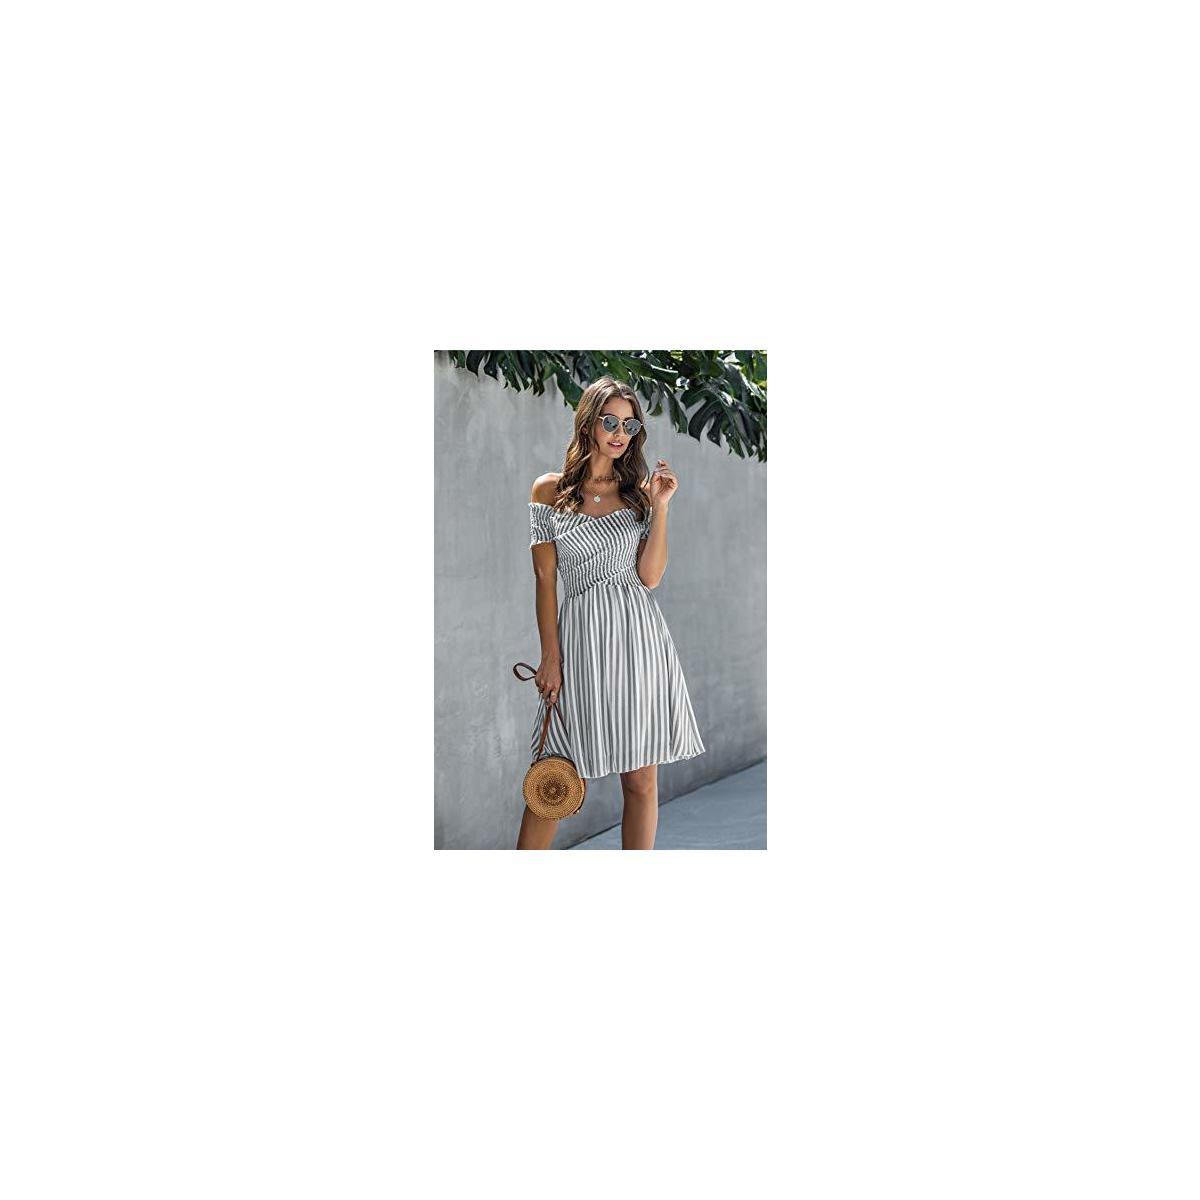 Minipeach Women's Bohemian Smocked Off Shoulder Summer Dress Ruffle Hem Striped Print Bandeau Shirred Dress